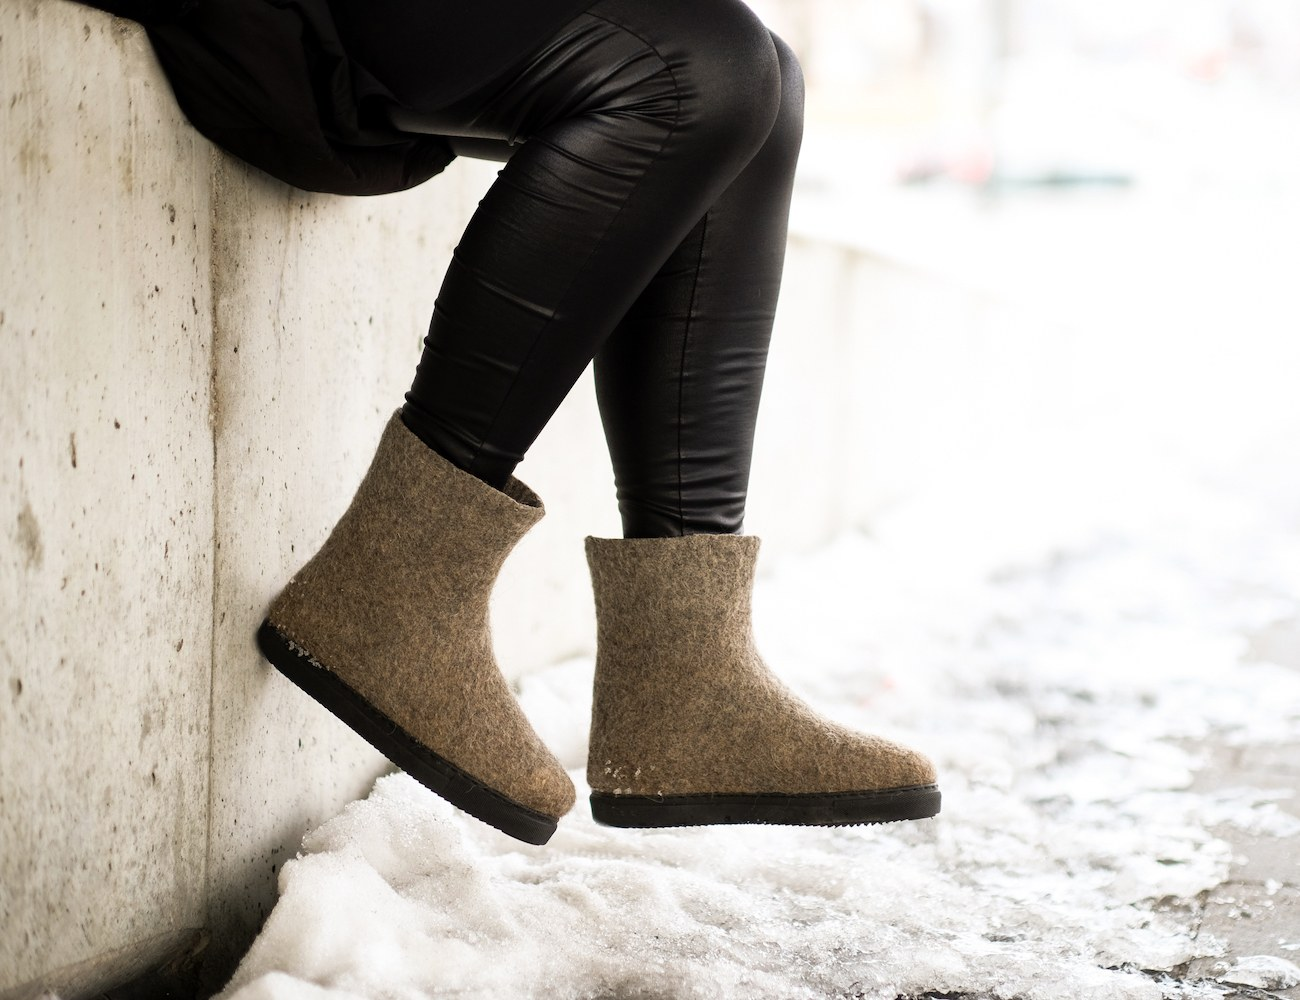 Felt Forma Women's Eco-Friendly Wool Snow Boots » Gadget Flow